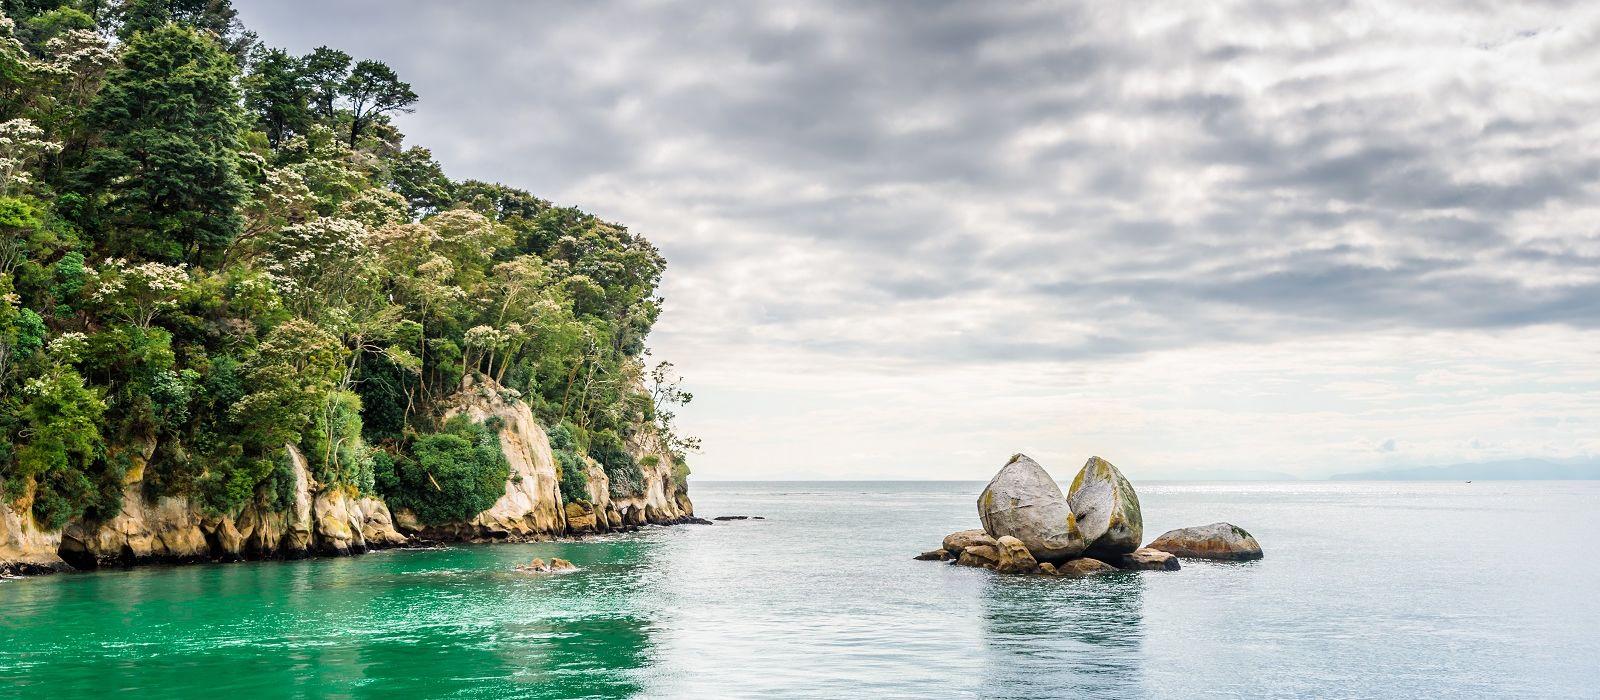 New Zealand: Art, Wine and Beach Tour Trip 7